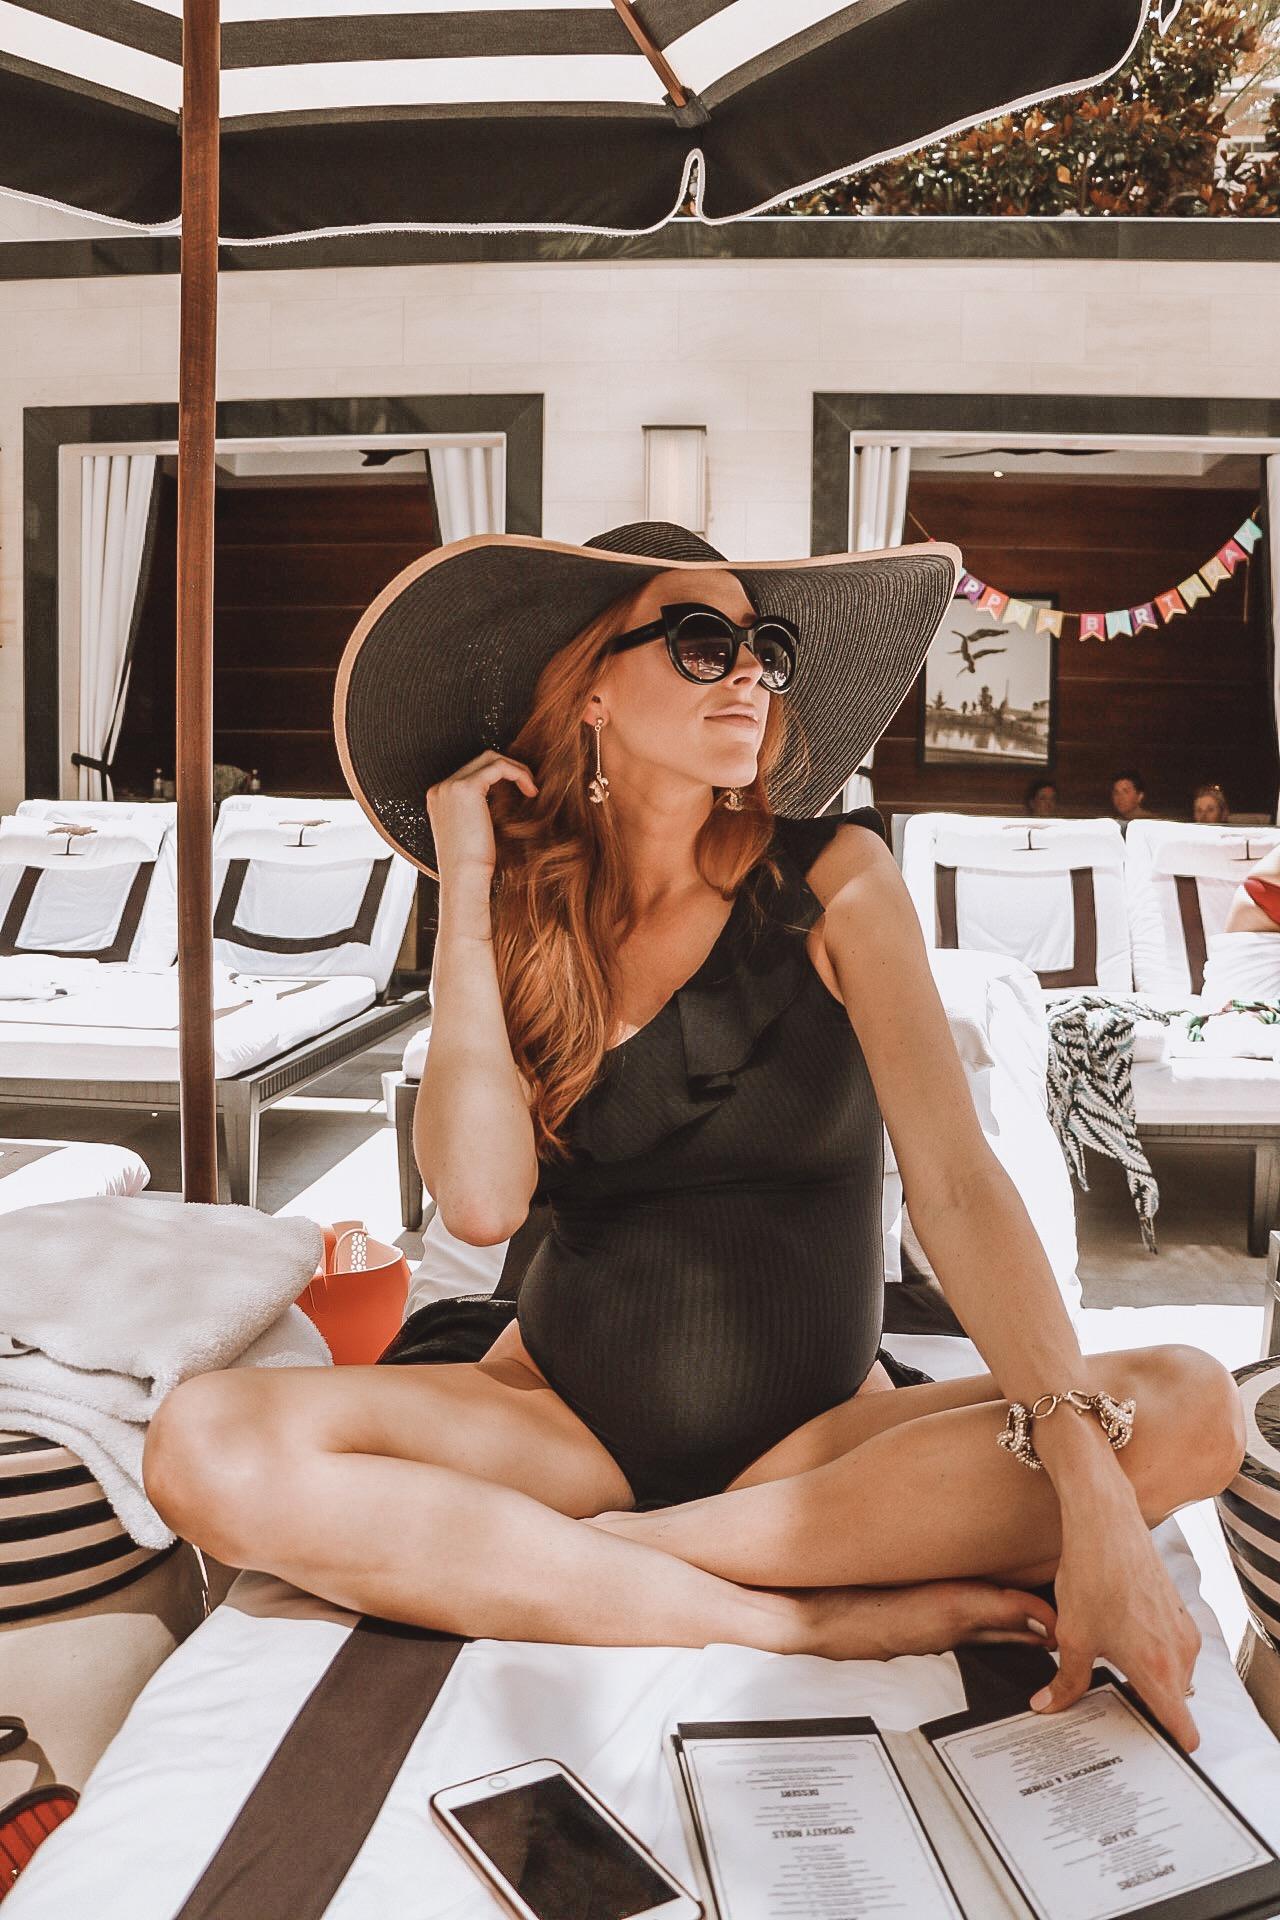 The Post Oak Hotel: A Luxury Getaway in the Heart of Houston